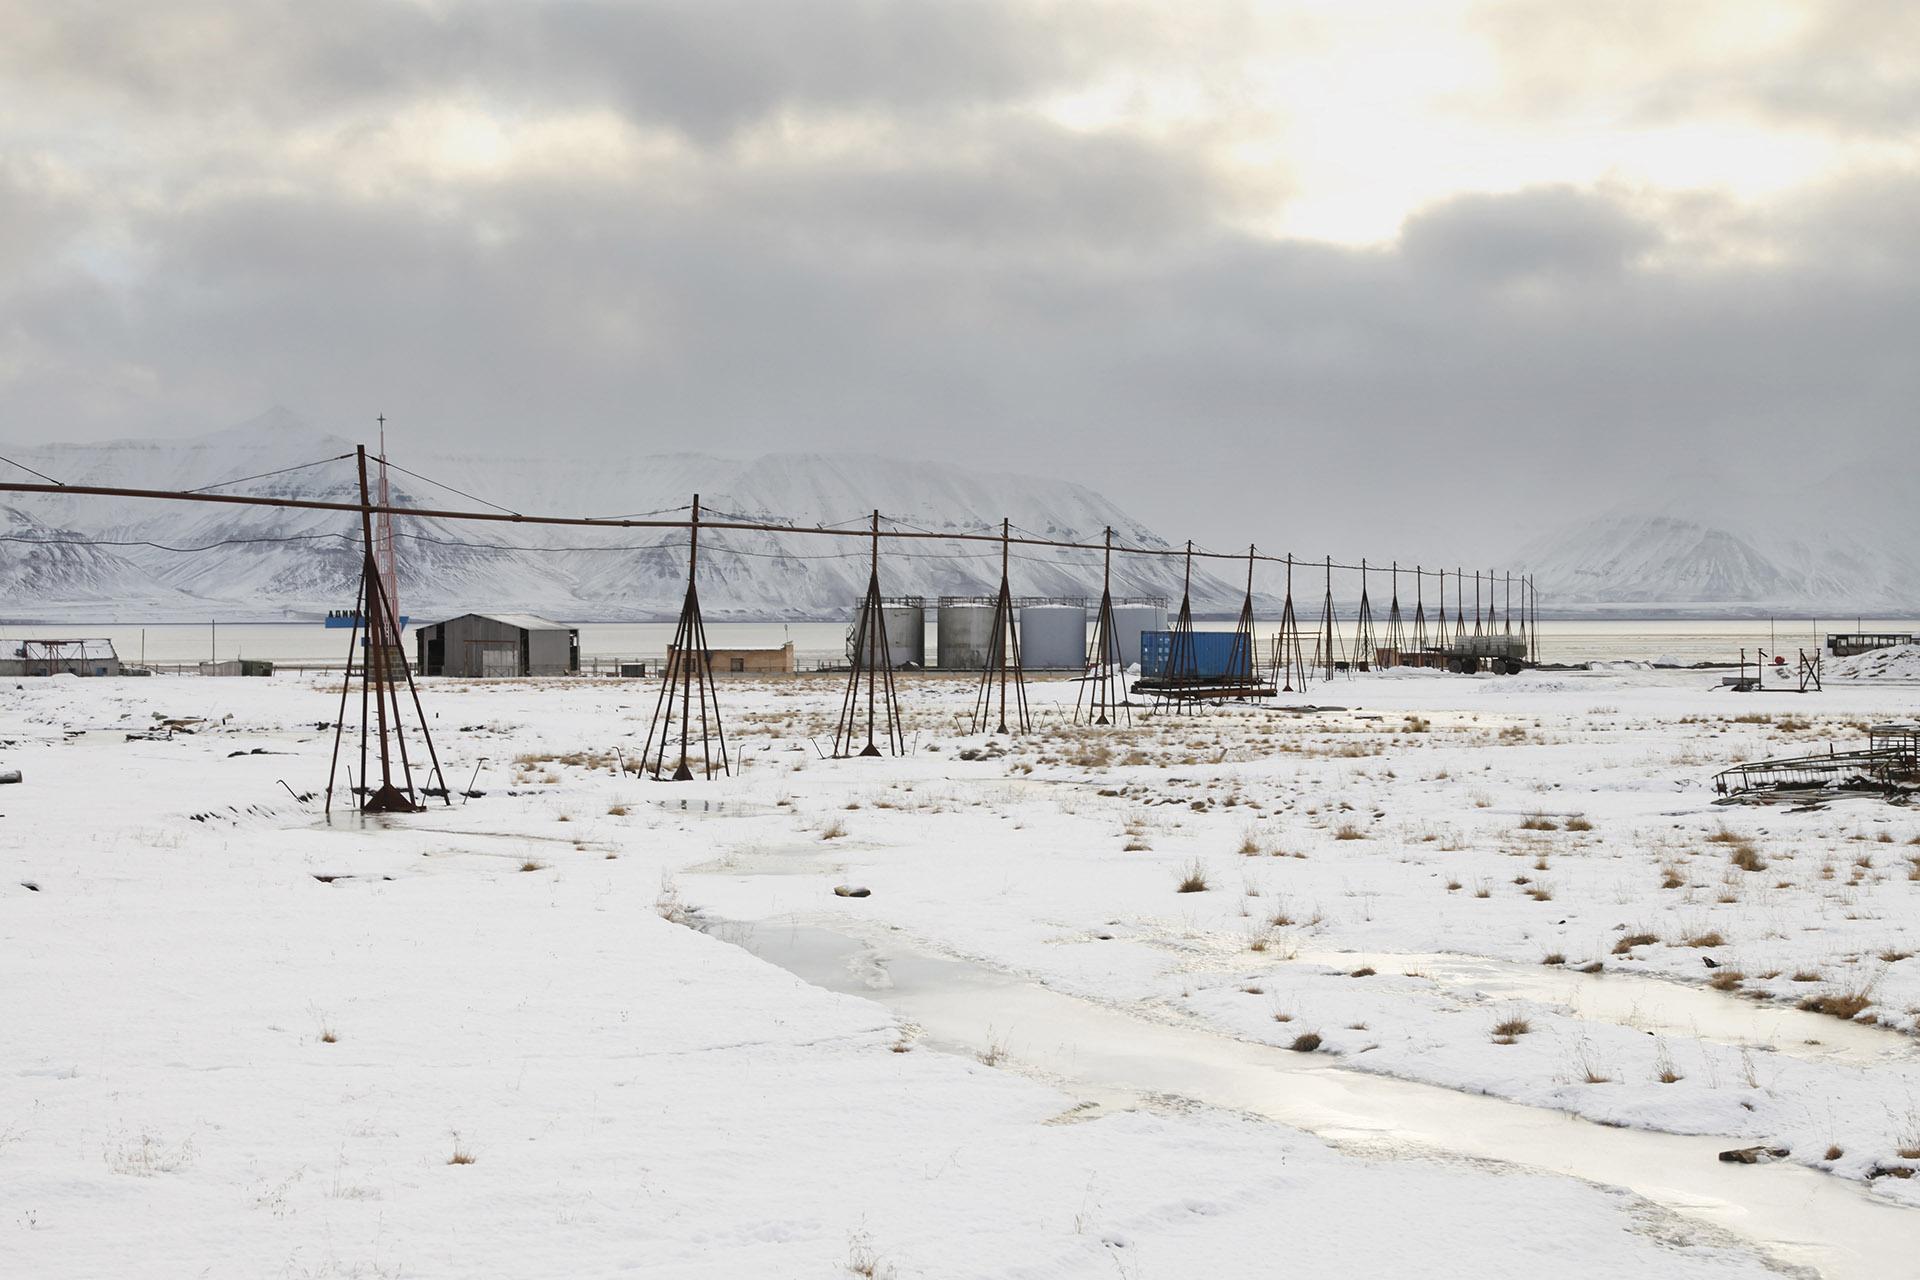 Pyramiden, Spitsbergen, Svalbard, Arctic Ocean VI, 2013<br/>